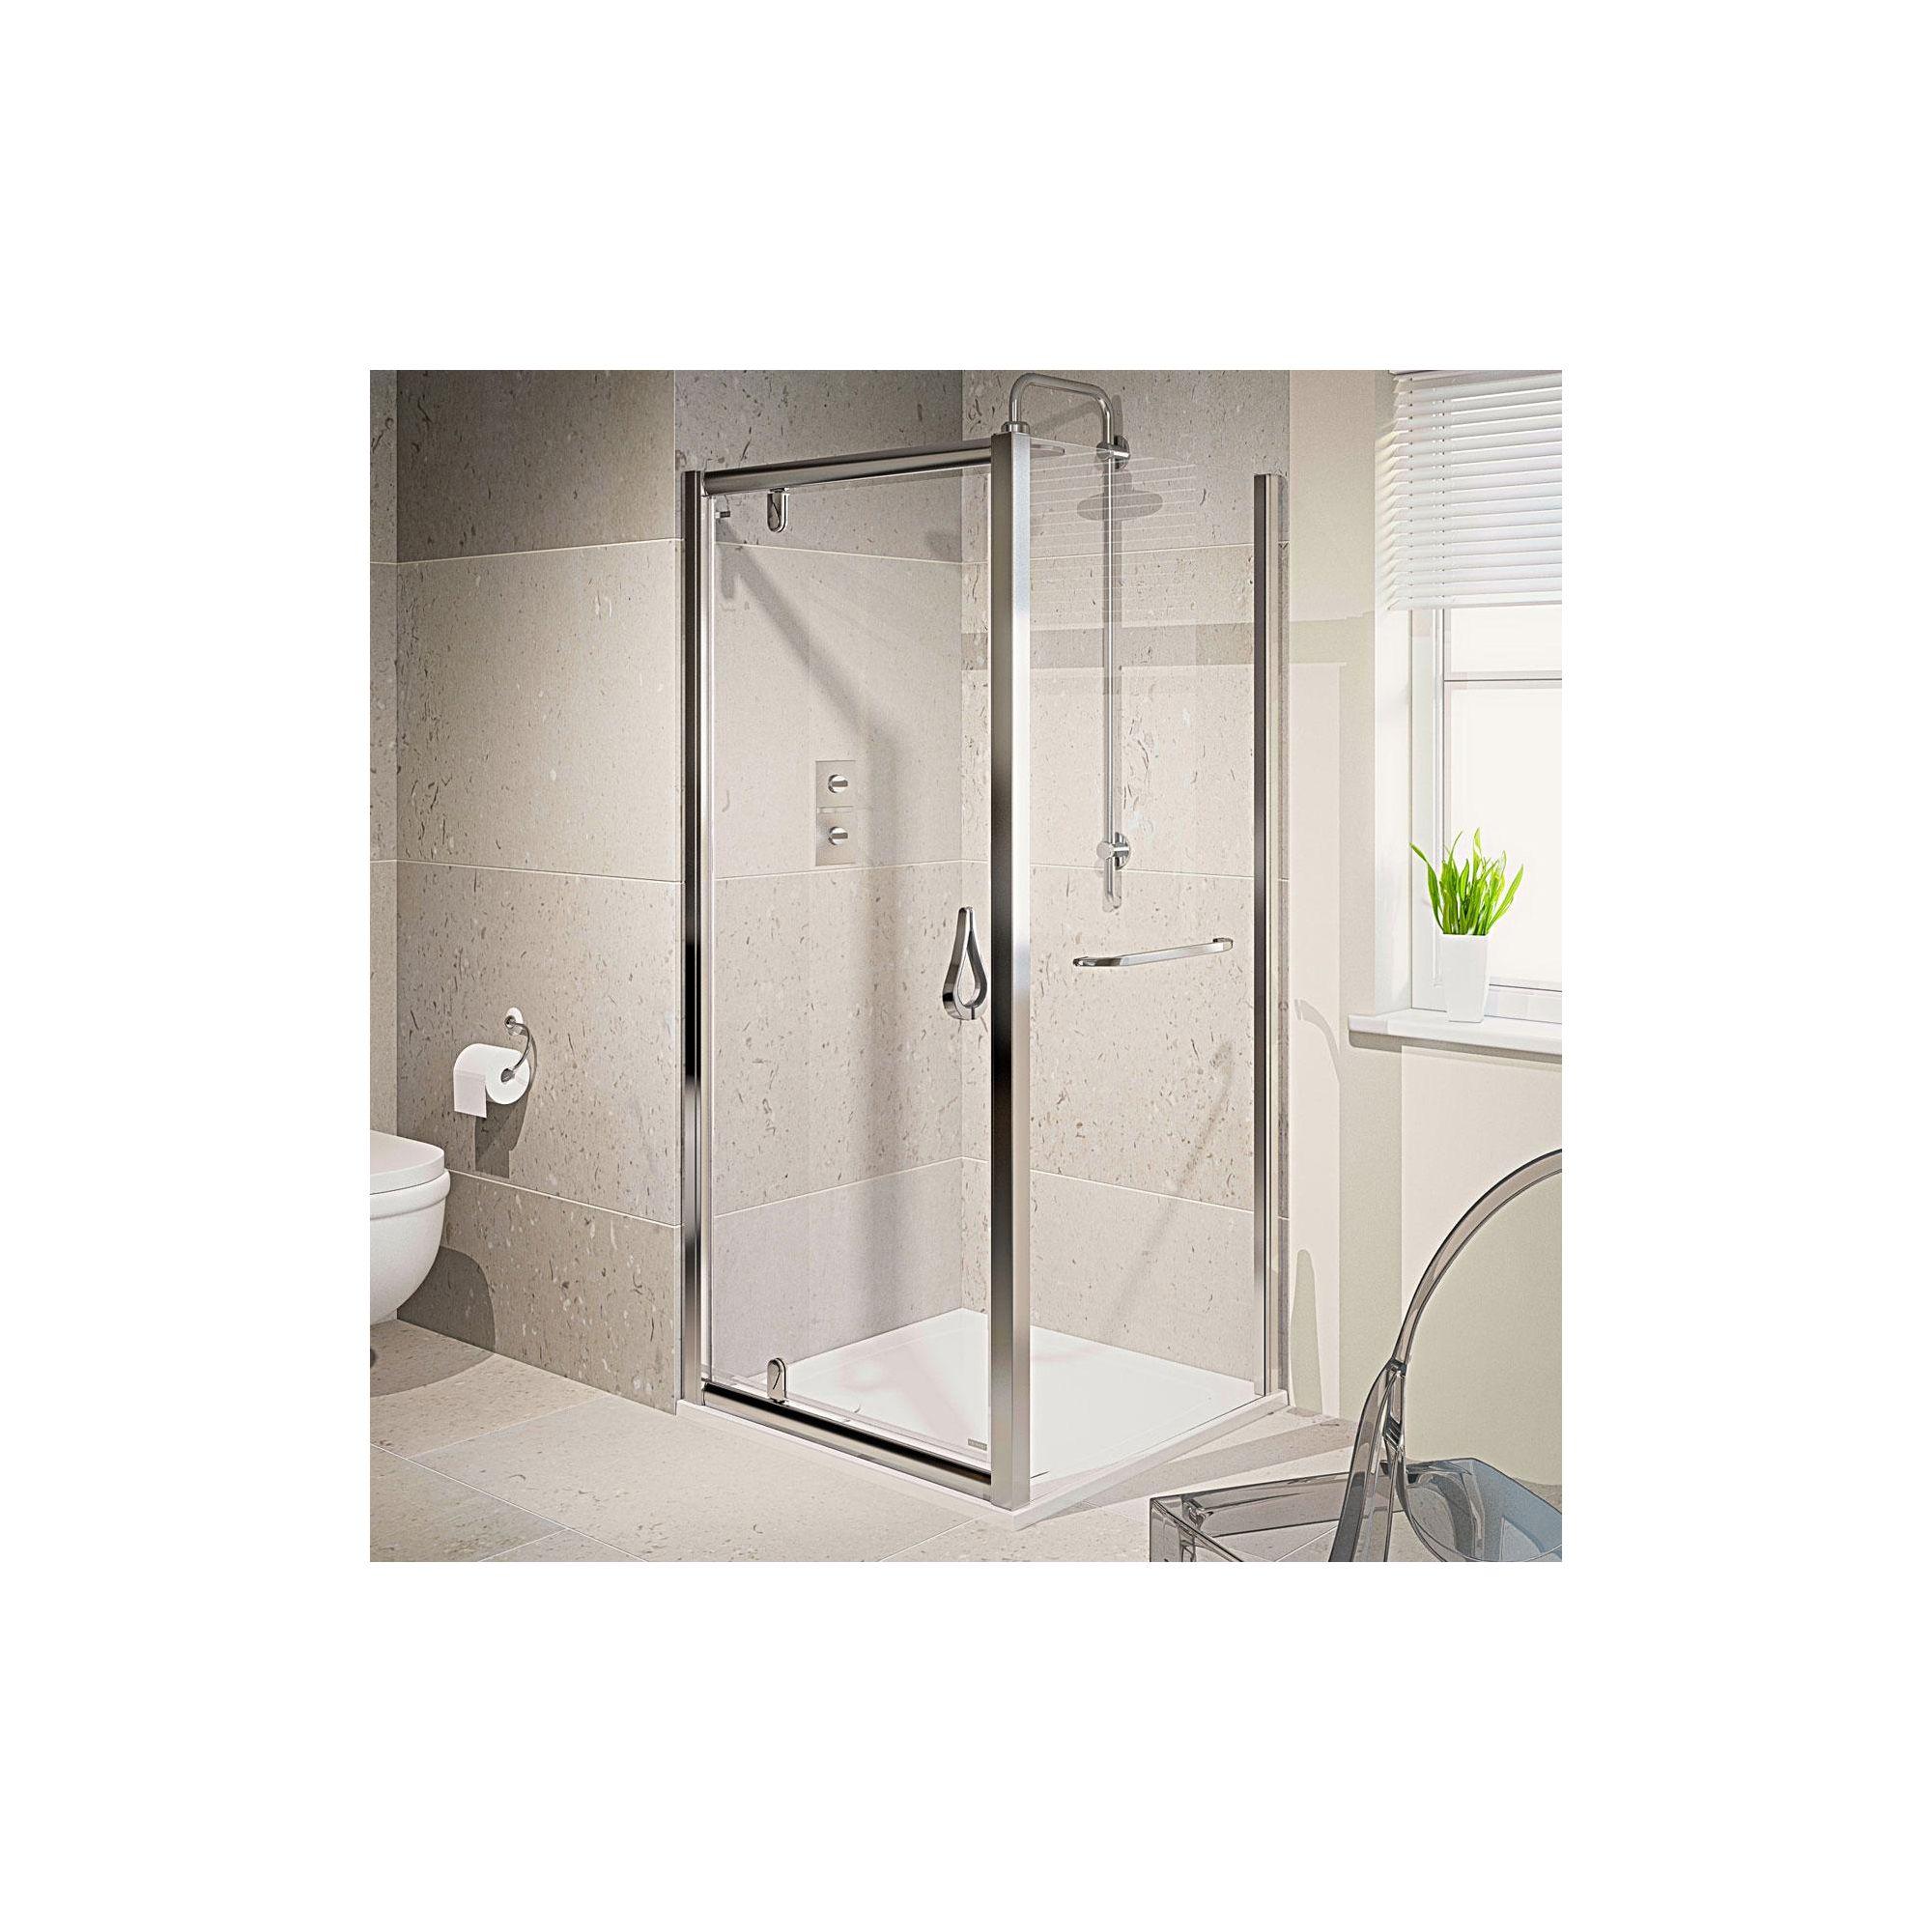 Aqualux AQUA6 Pivot Shower Door, 900mm Wide, Polished Silver Frame, 6mm Glass at Tesco Direct